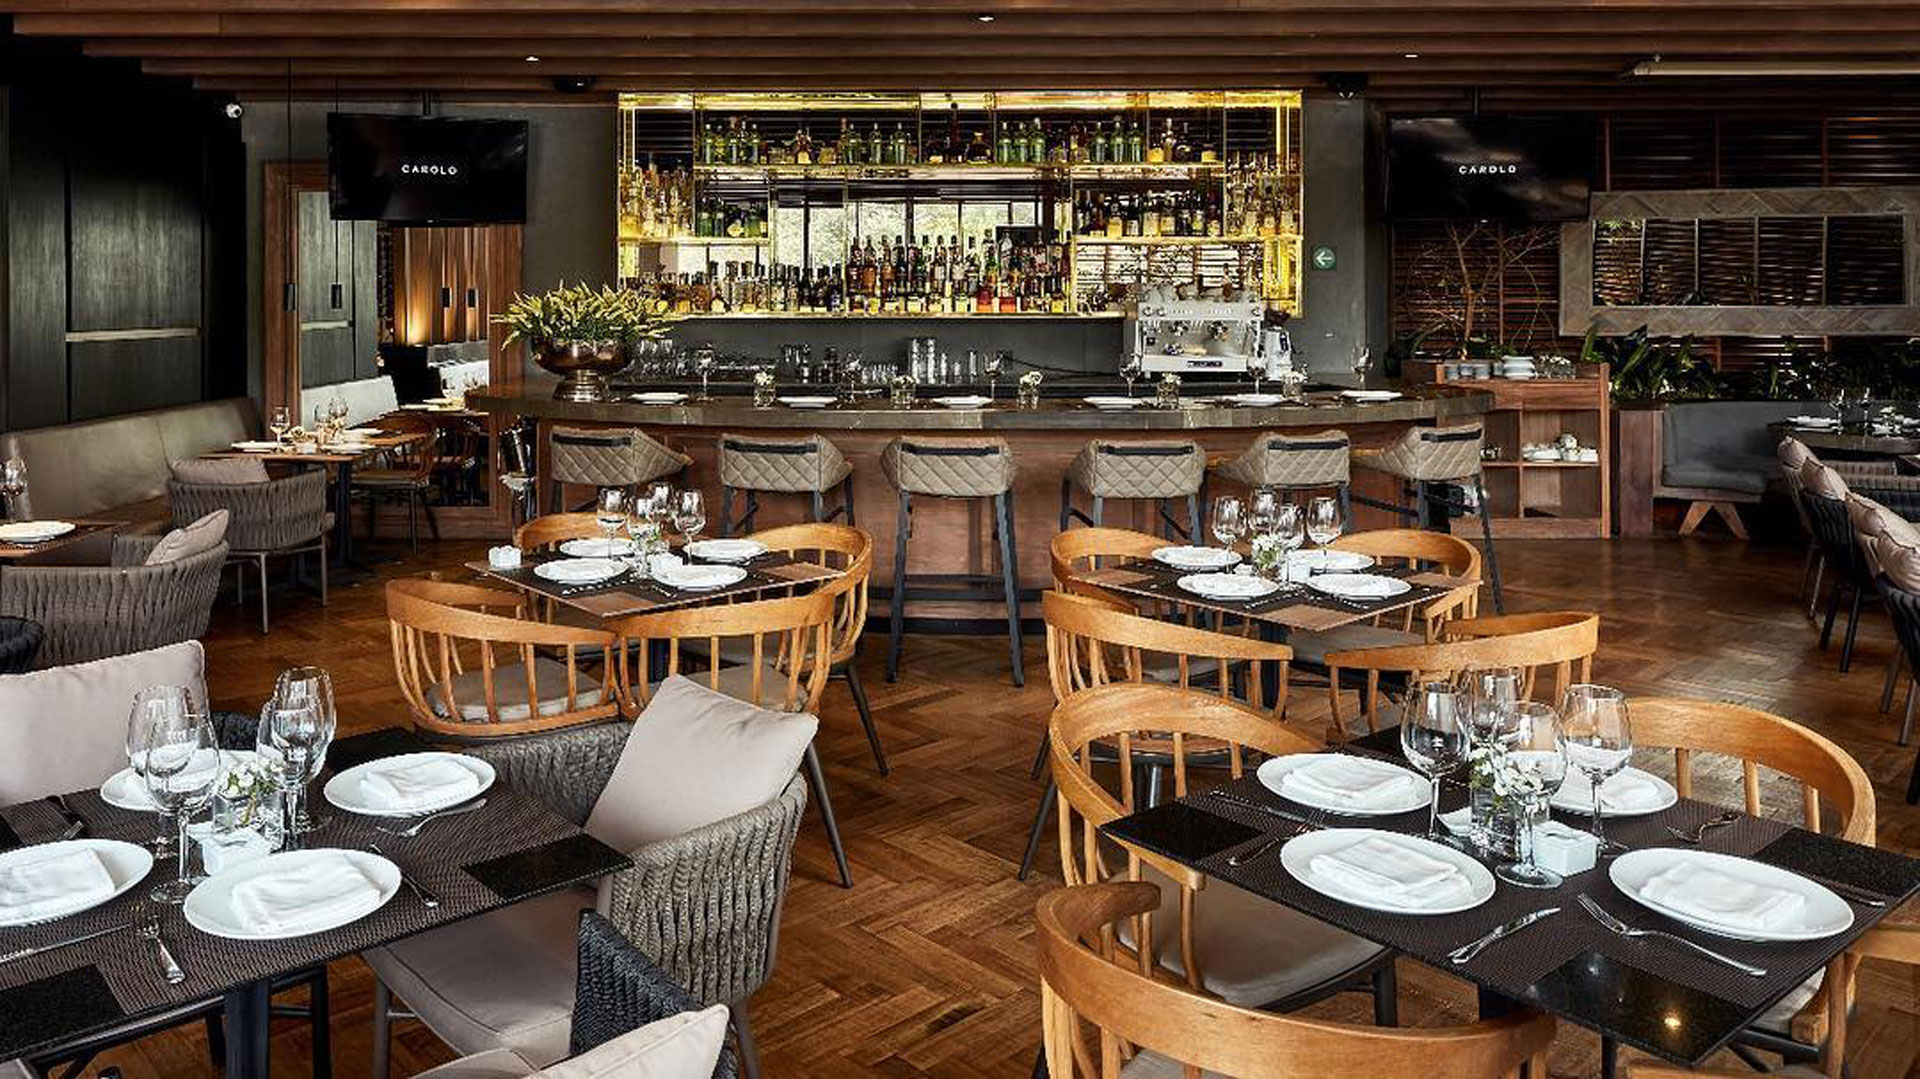 Restaurante Carolo